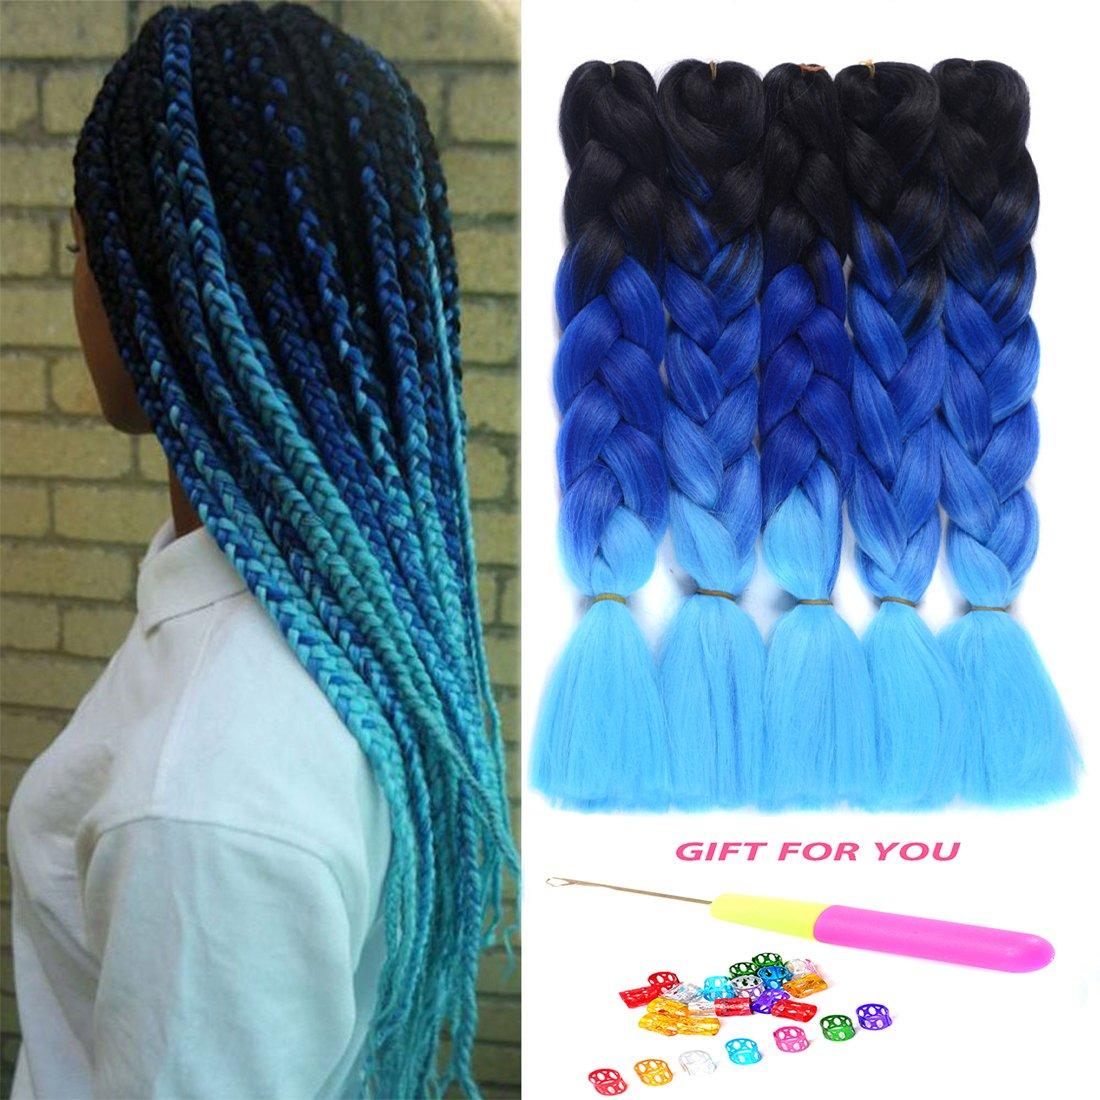 Ombre Jumbo Braids Hair Synthetic Max 90% OFF Kanekalon E Braiding Gifts